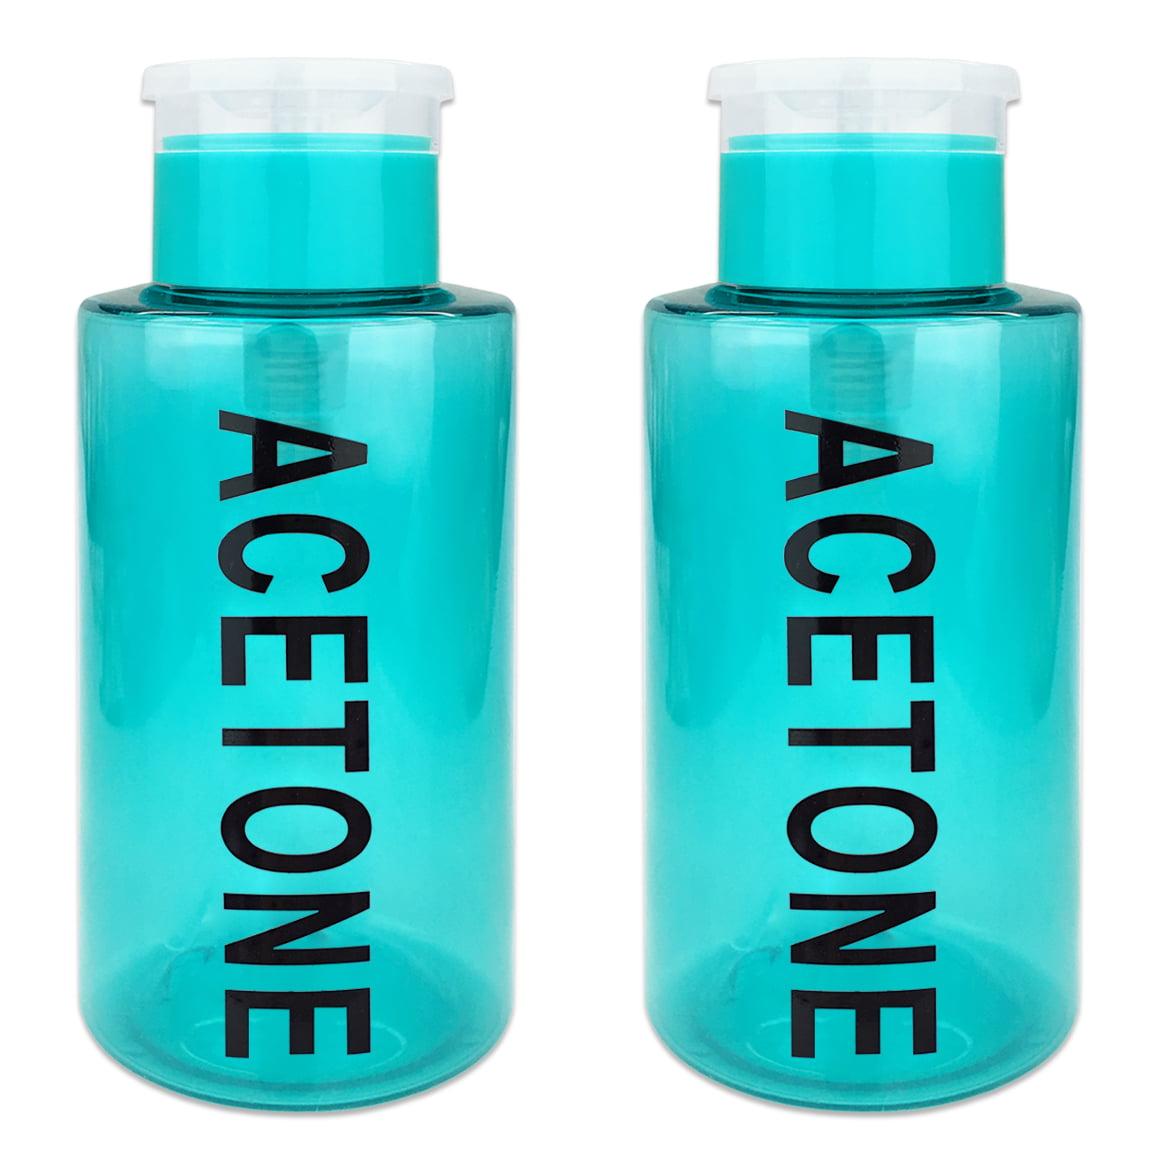 Pana High Quality 10oz Liquid Pump Dispenser With Acetone Label - Clear (2 Bottles)